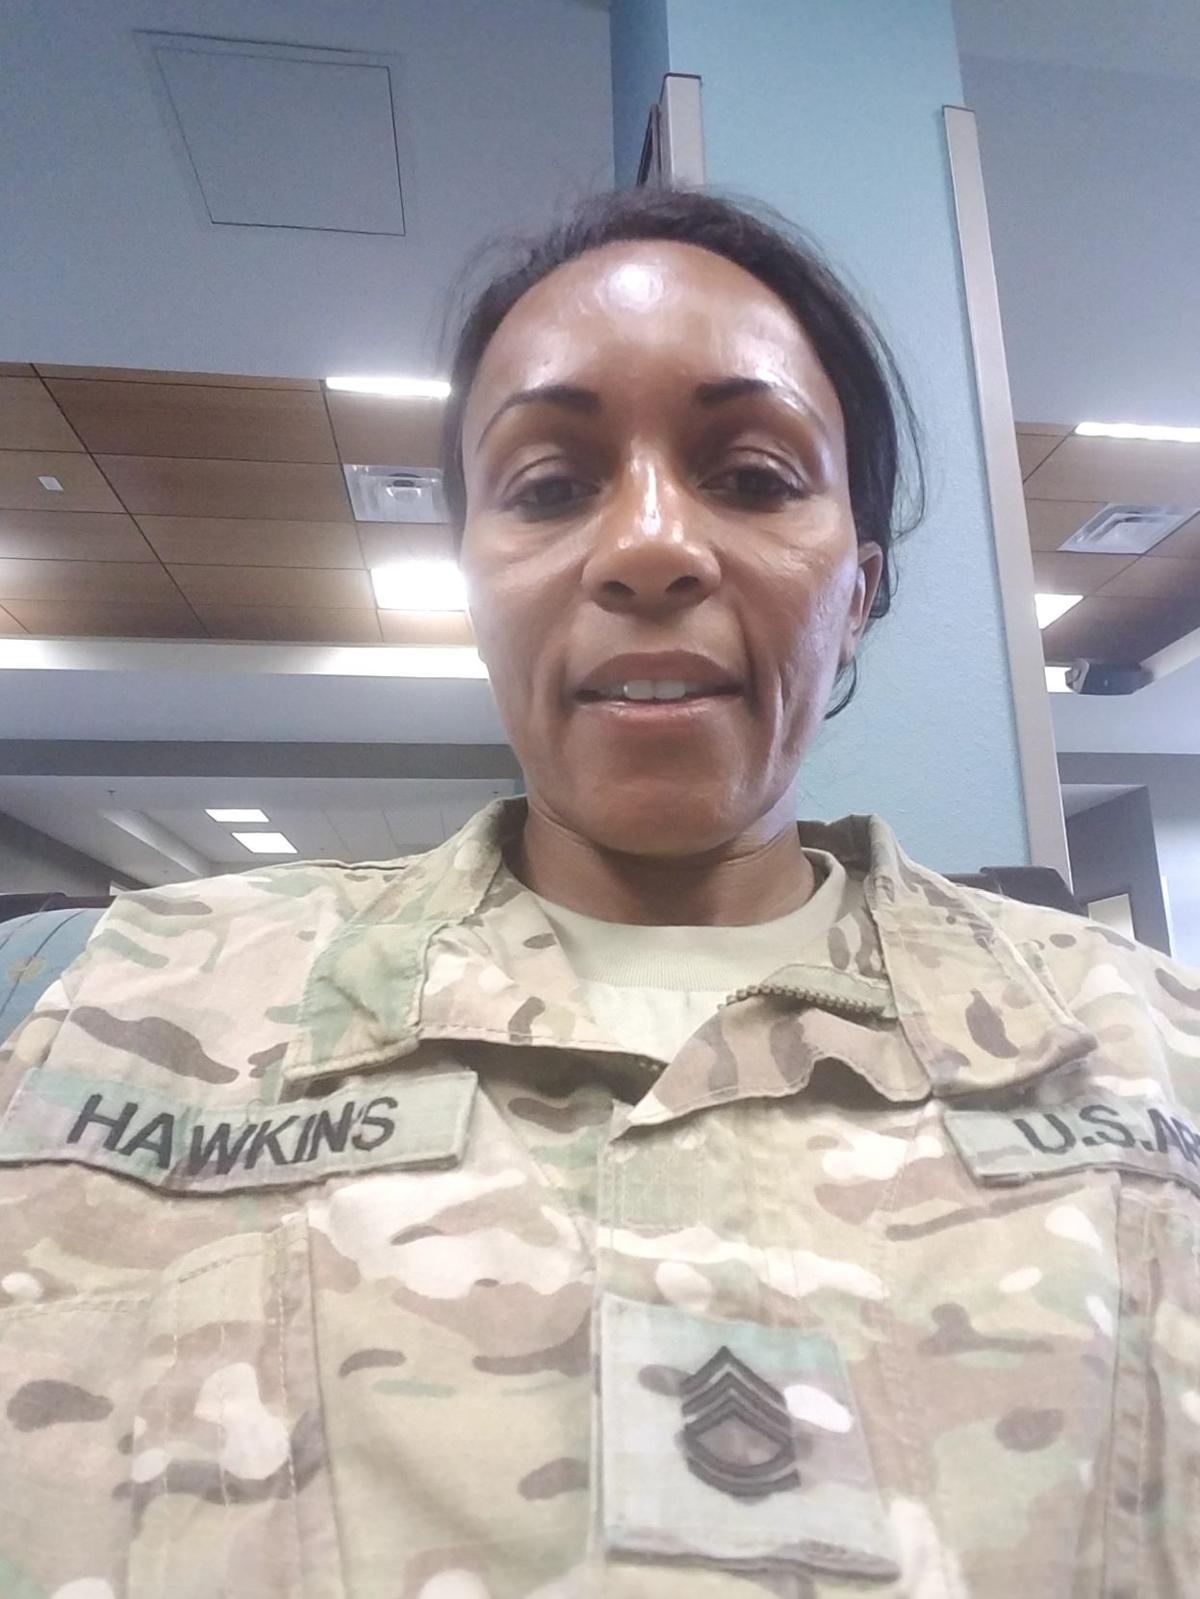 Sgt. 1st Class Caroline Hawkins Blaze